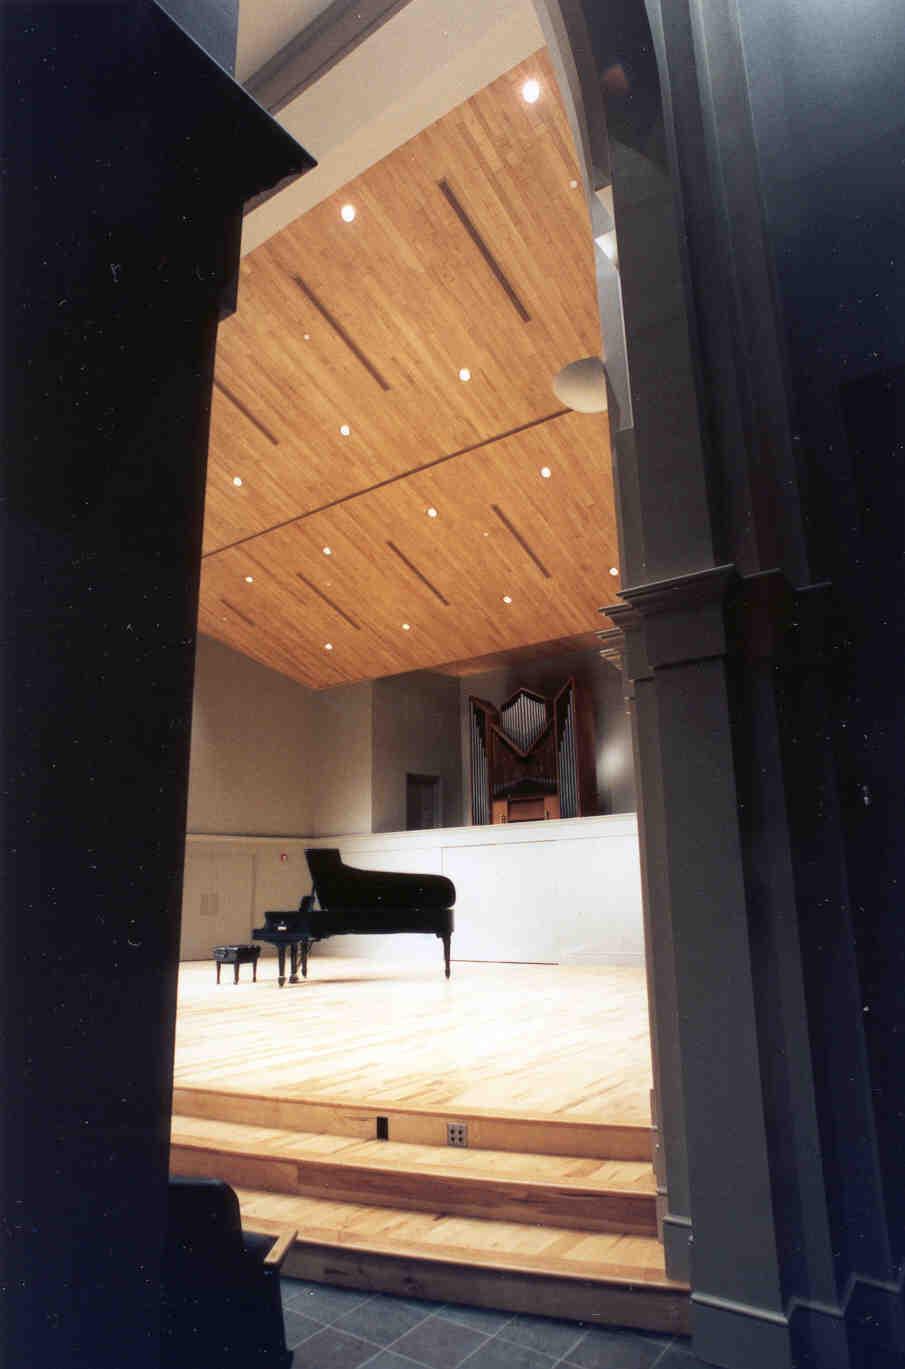 www.rcmarchitects.com - bluffton university - yoder recital hall (5)